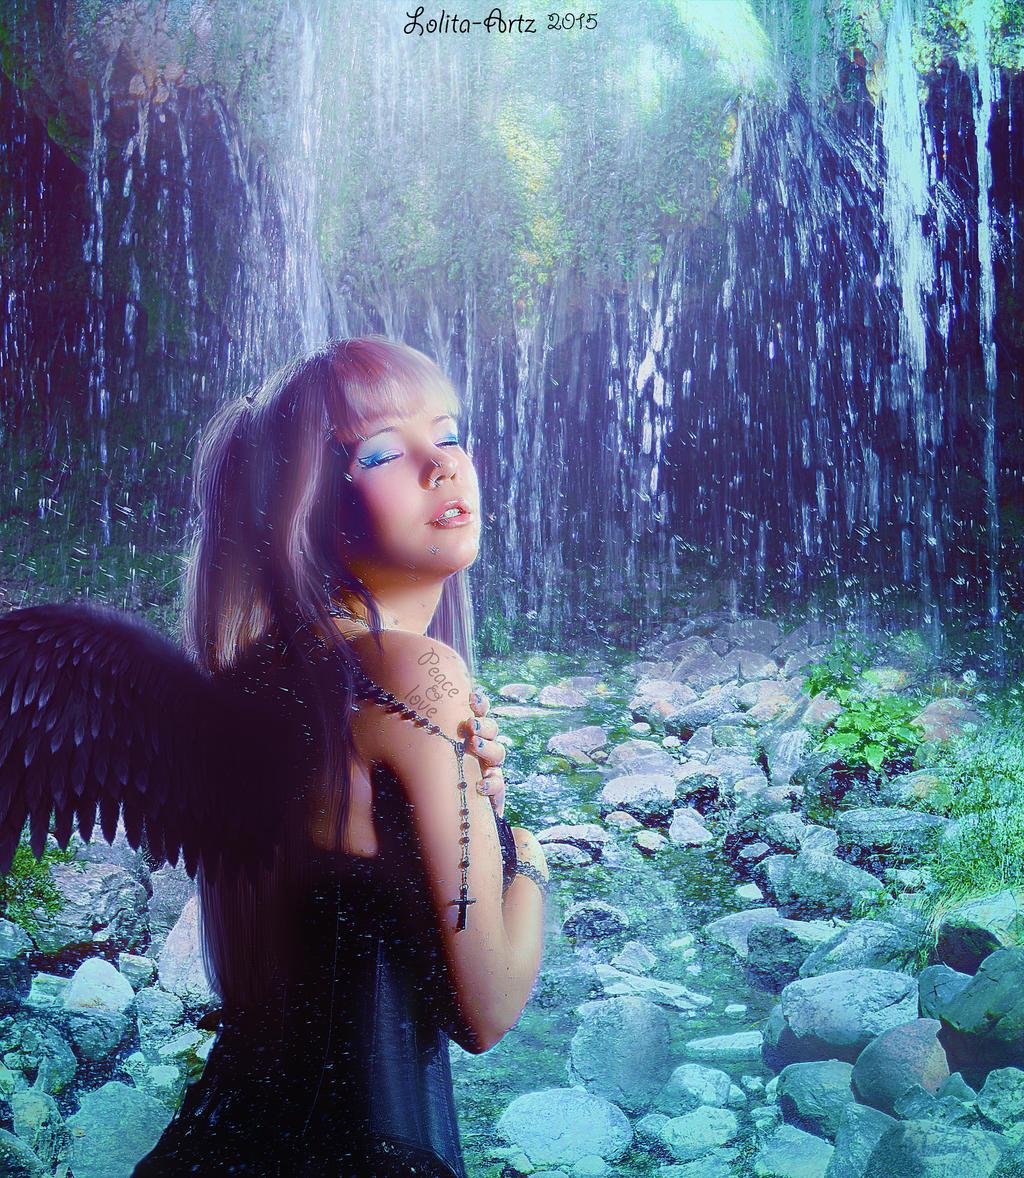 Peace and love (PRINTS) by Lolita-Artz